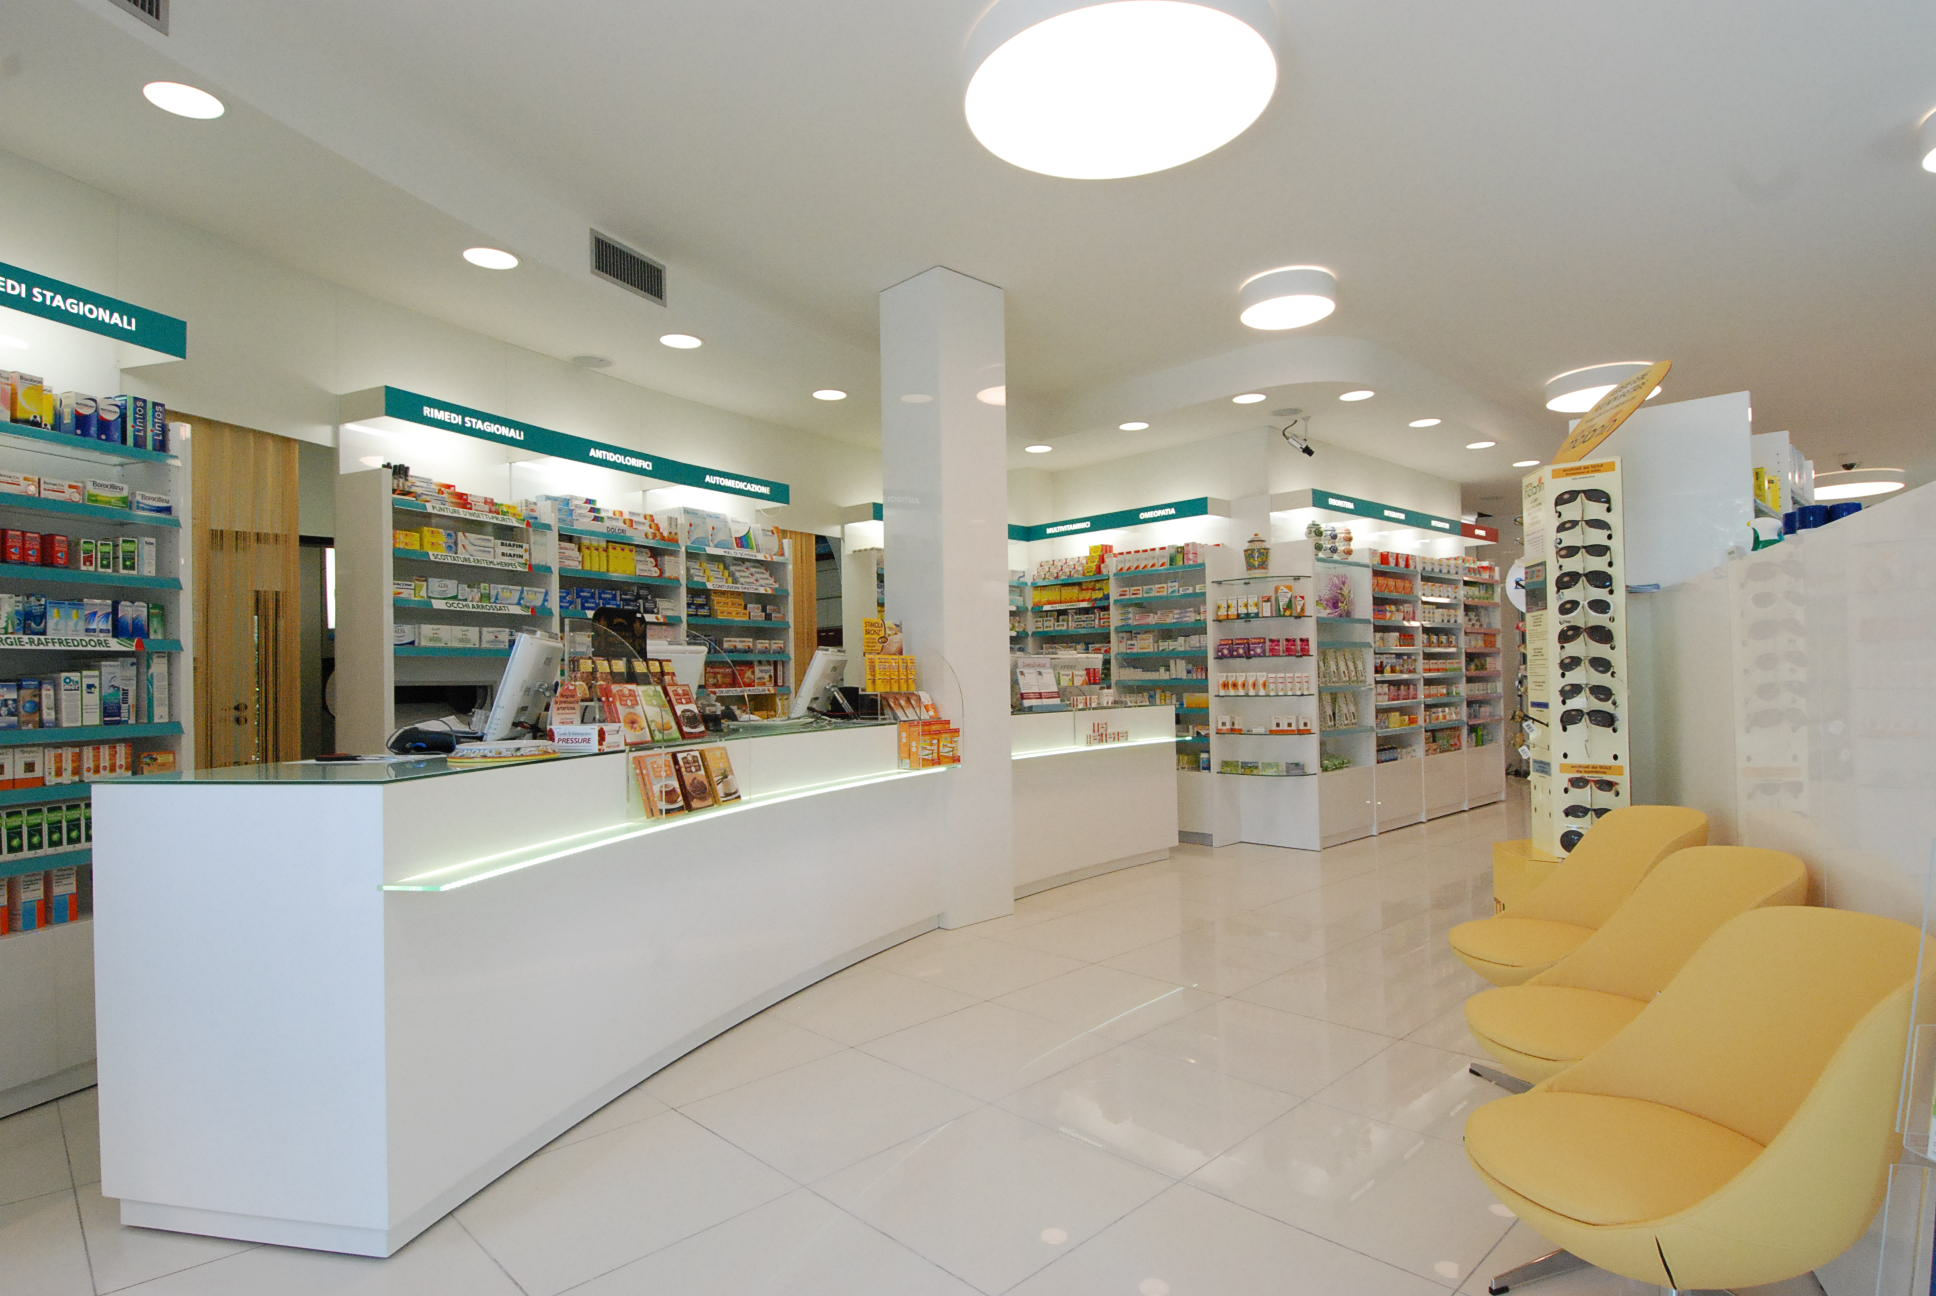 Sebrim sebrim arredo farmacie parafarmacie studi for Arredamenti farmacie